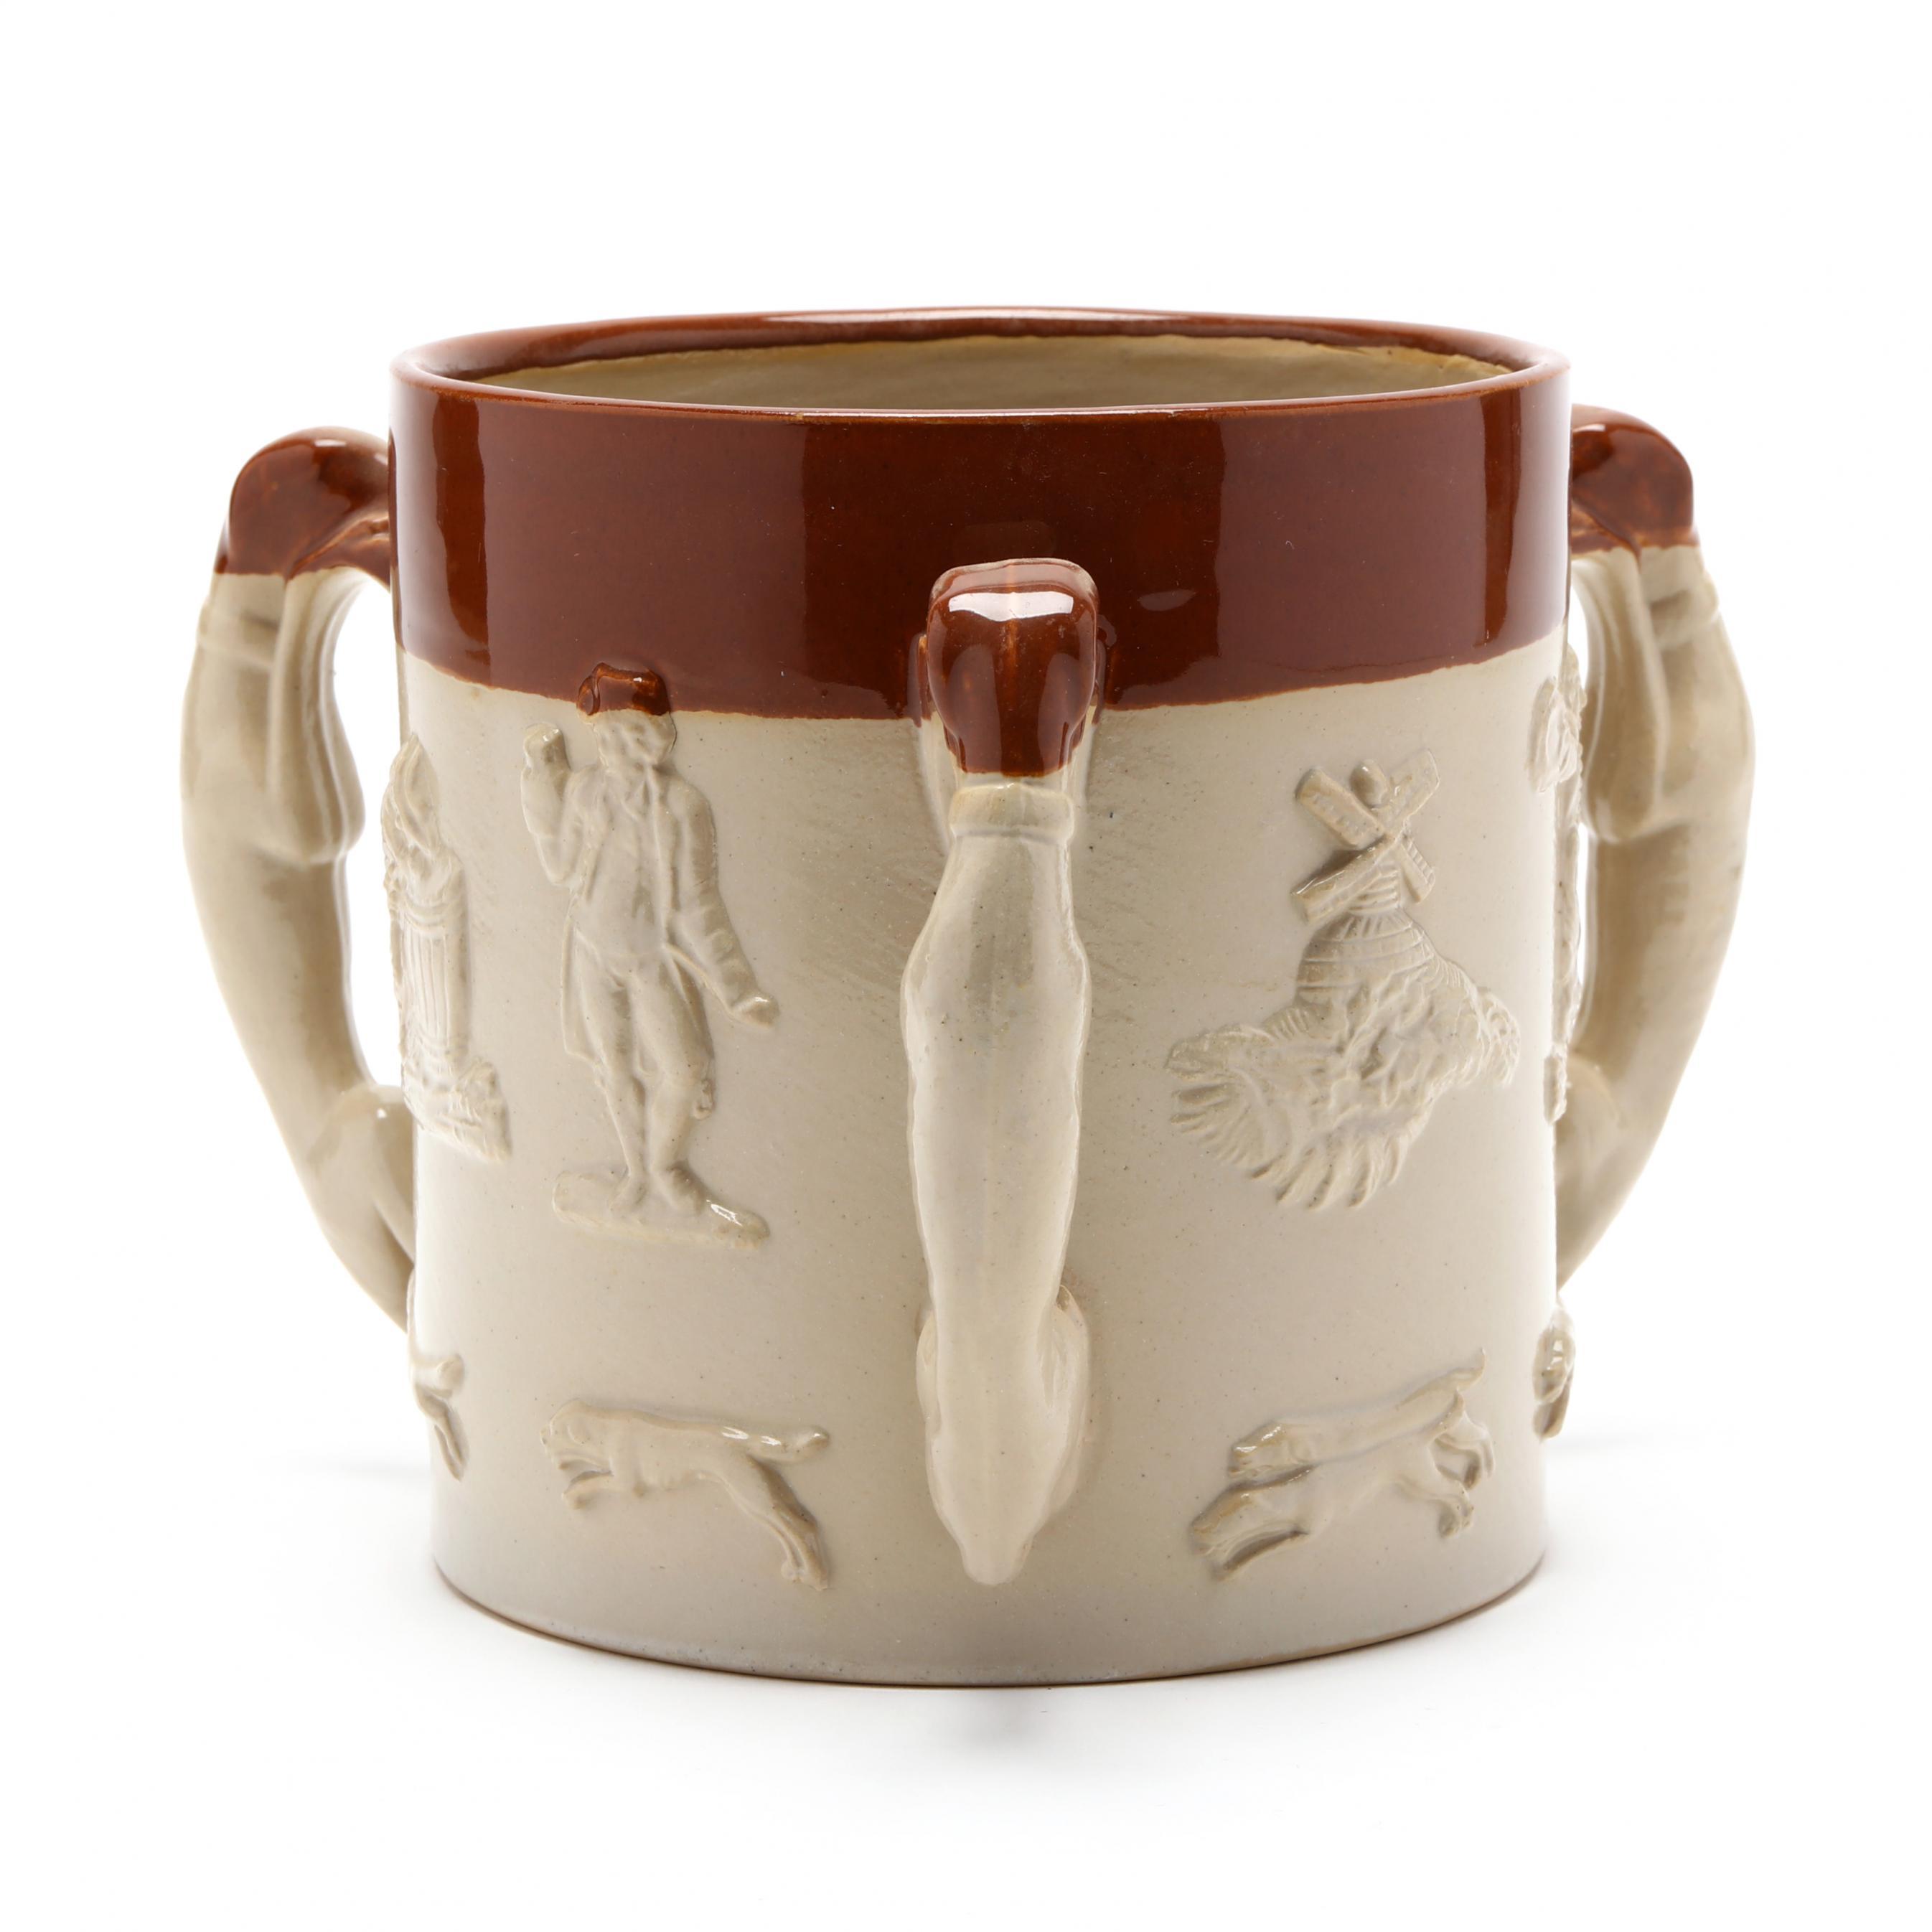 english-stoneware-tankard-or-tyg-cup